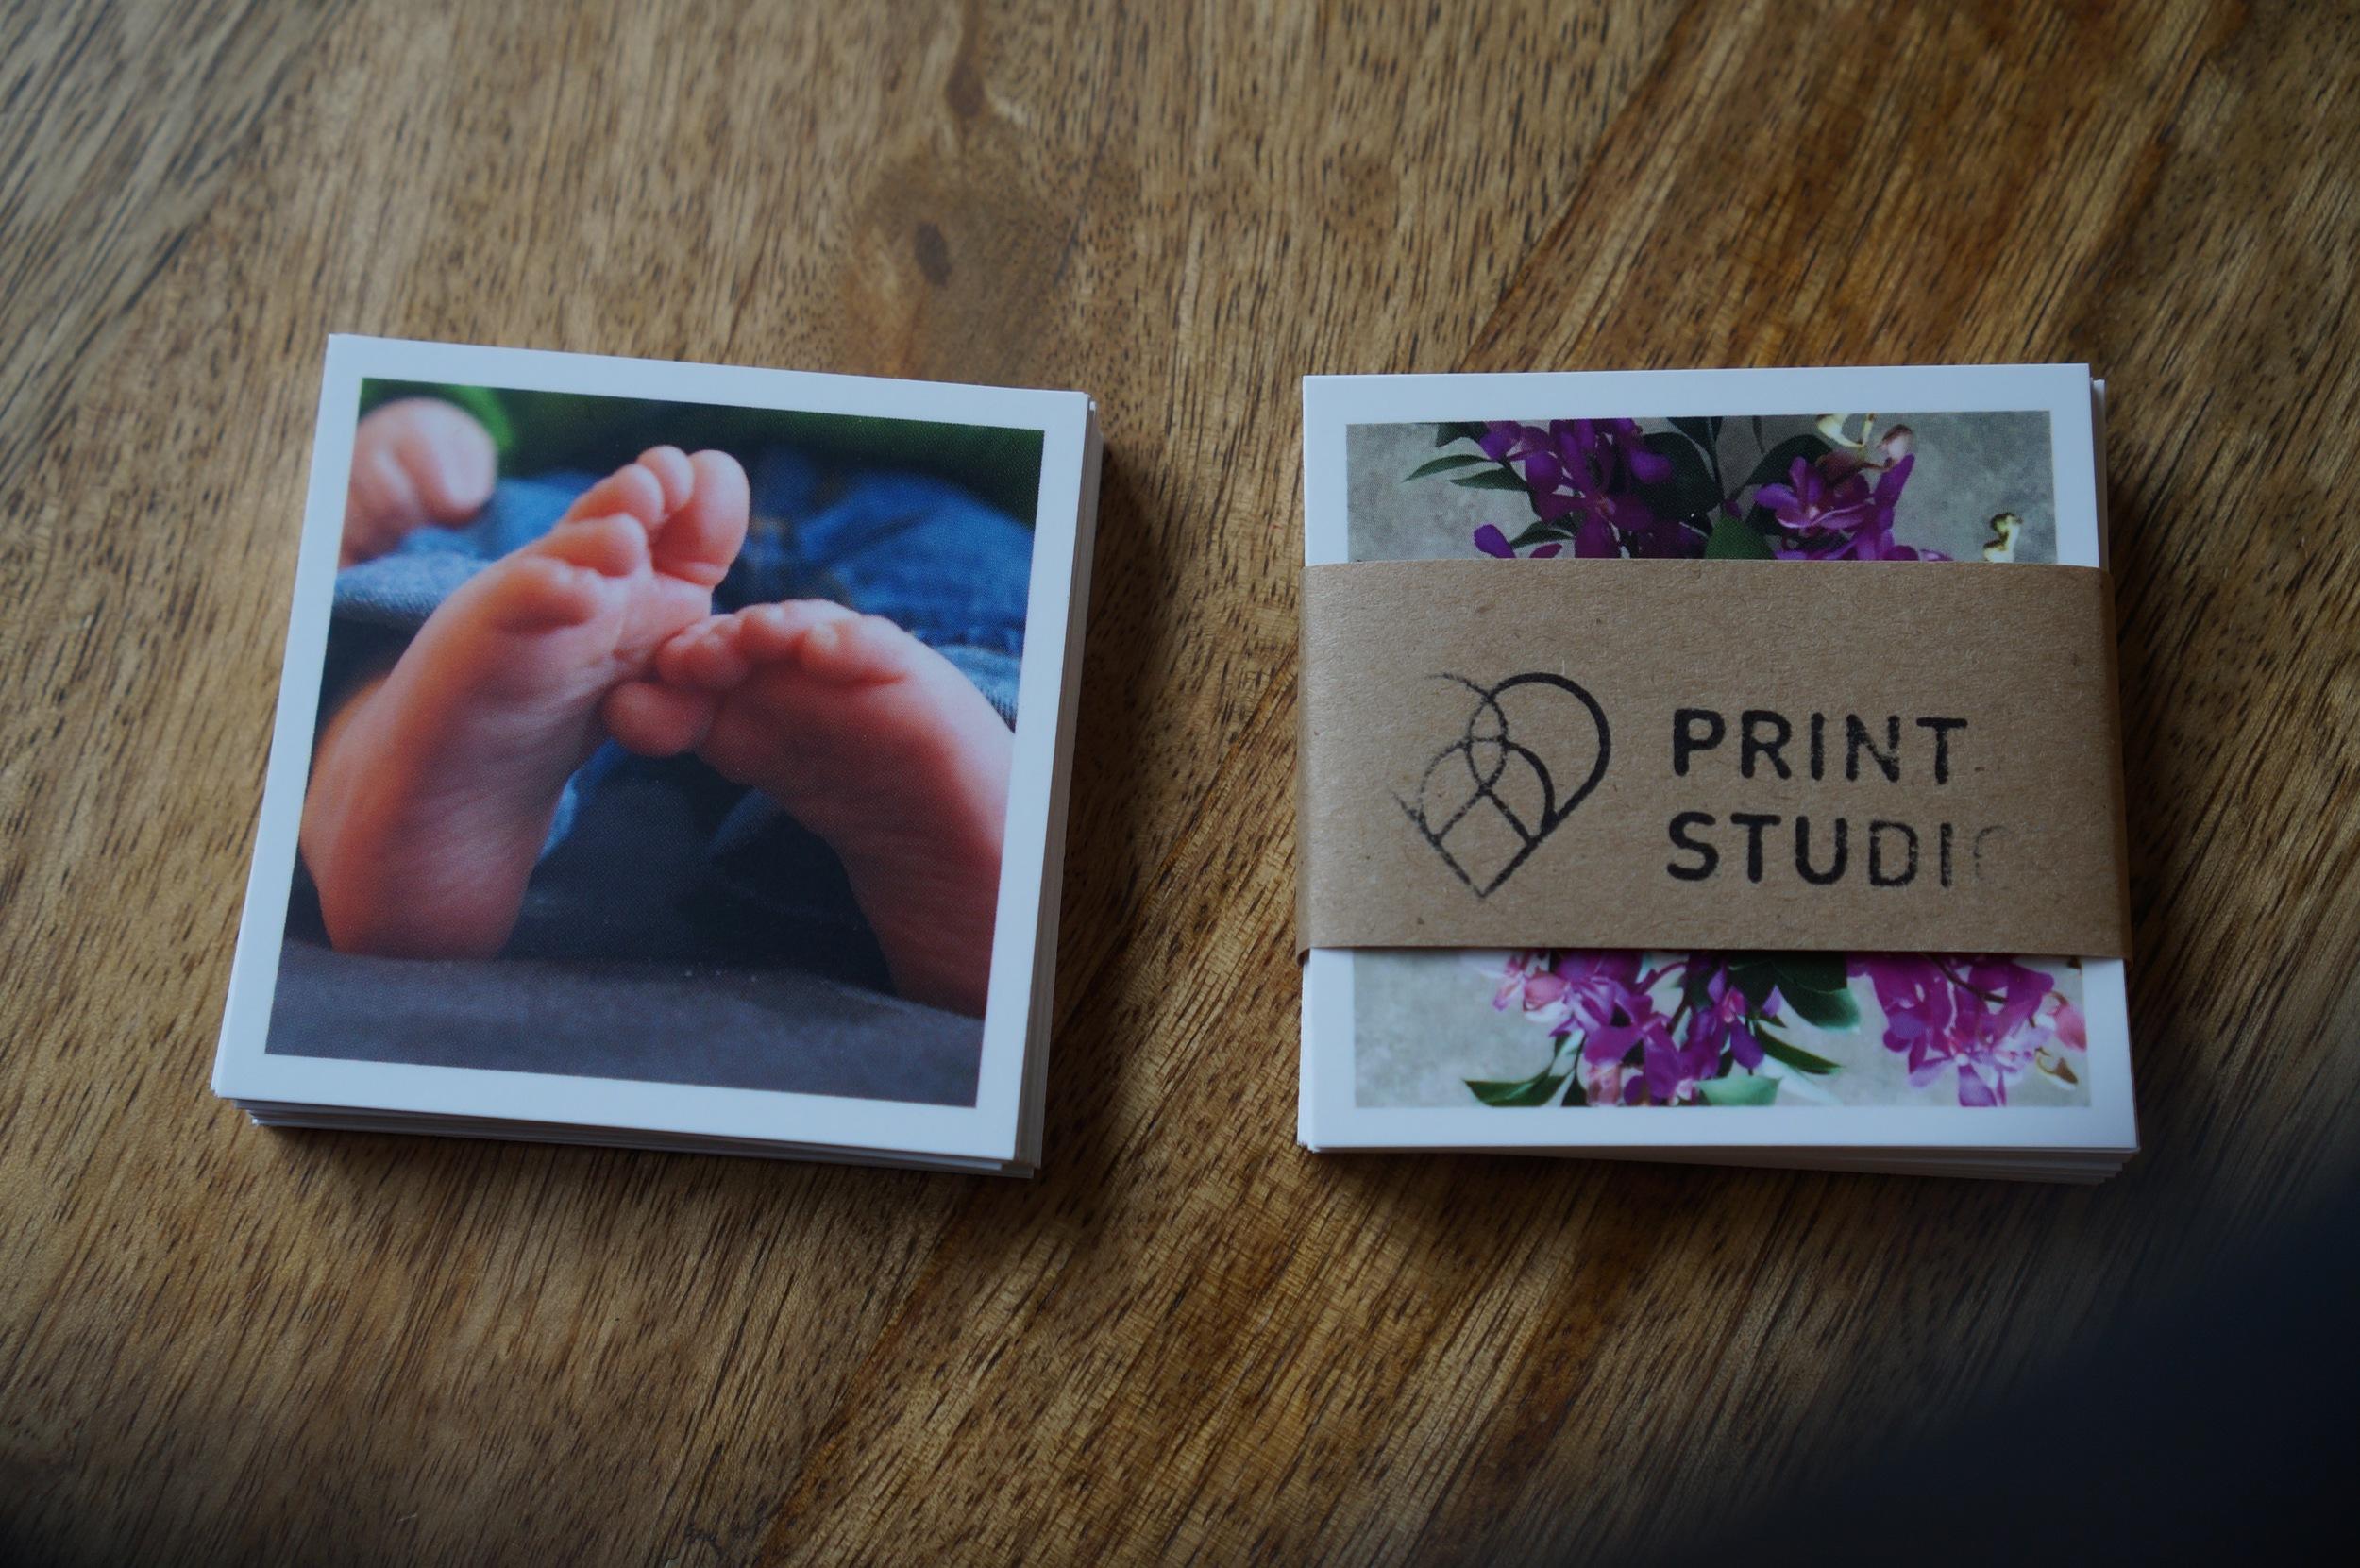 2x2 prints from Social Print Studio.